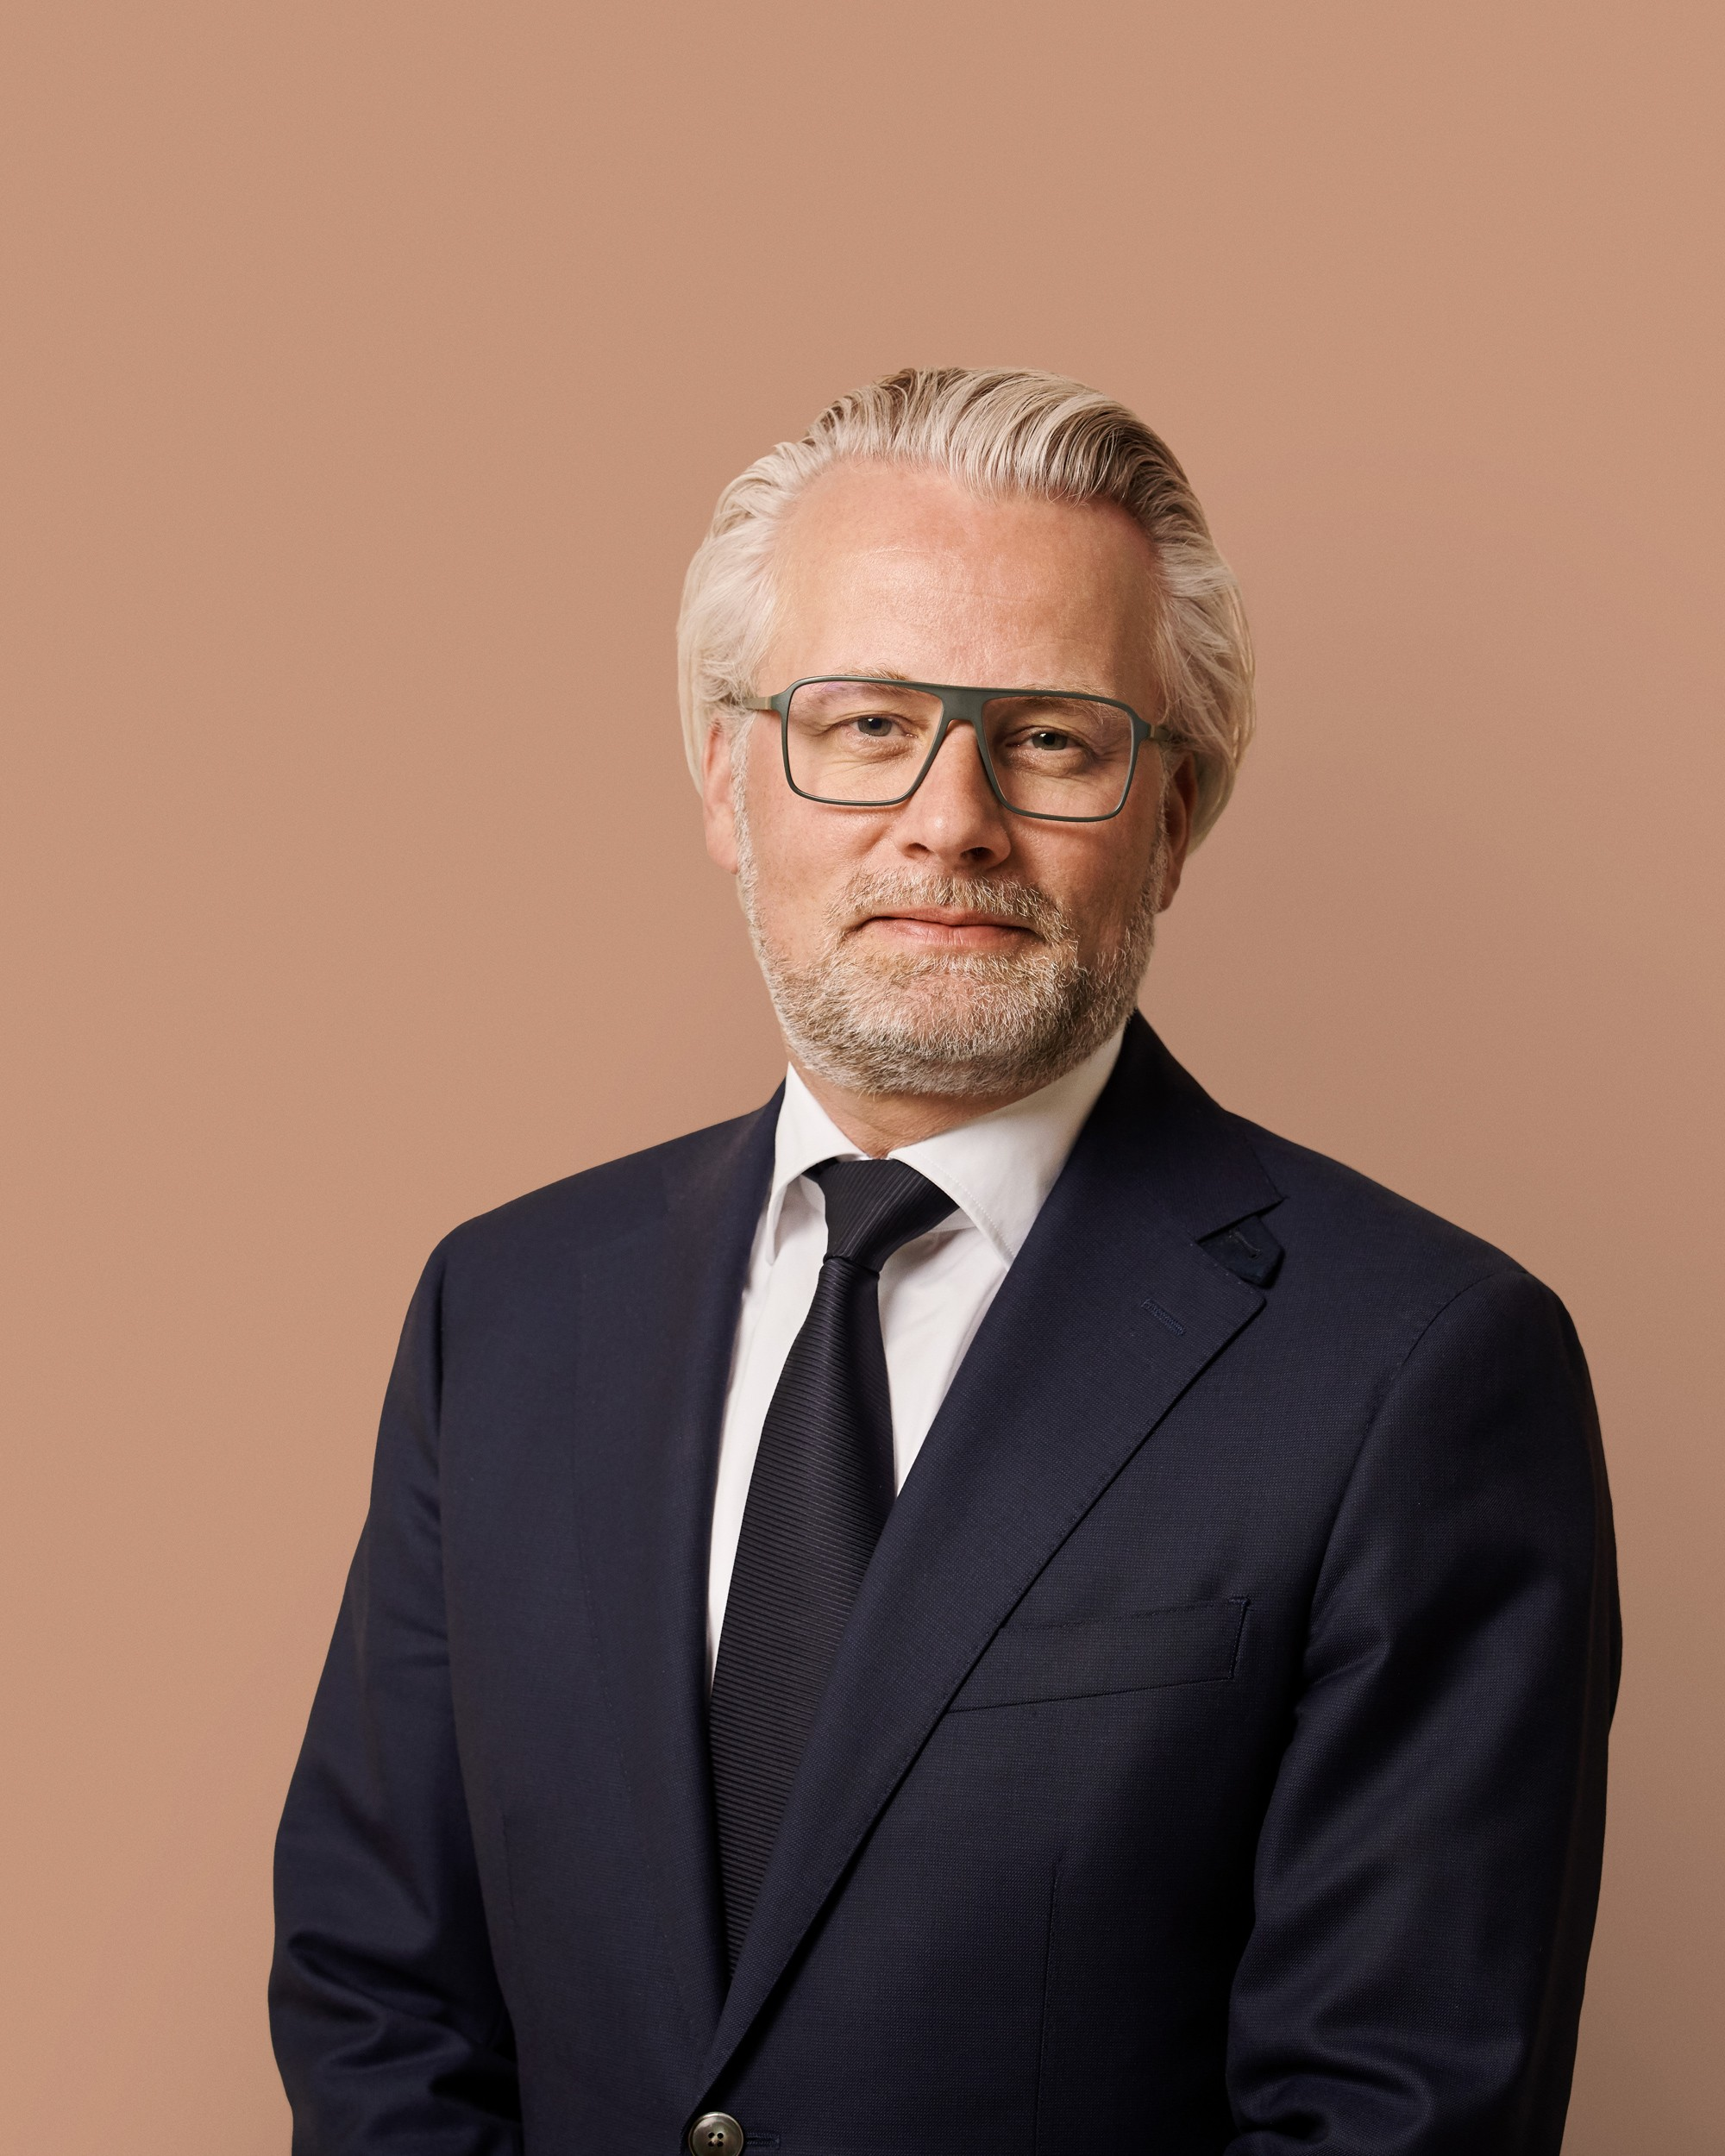 Peter Giørtz-Carlsen